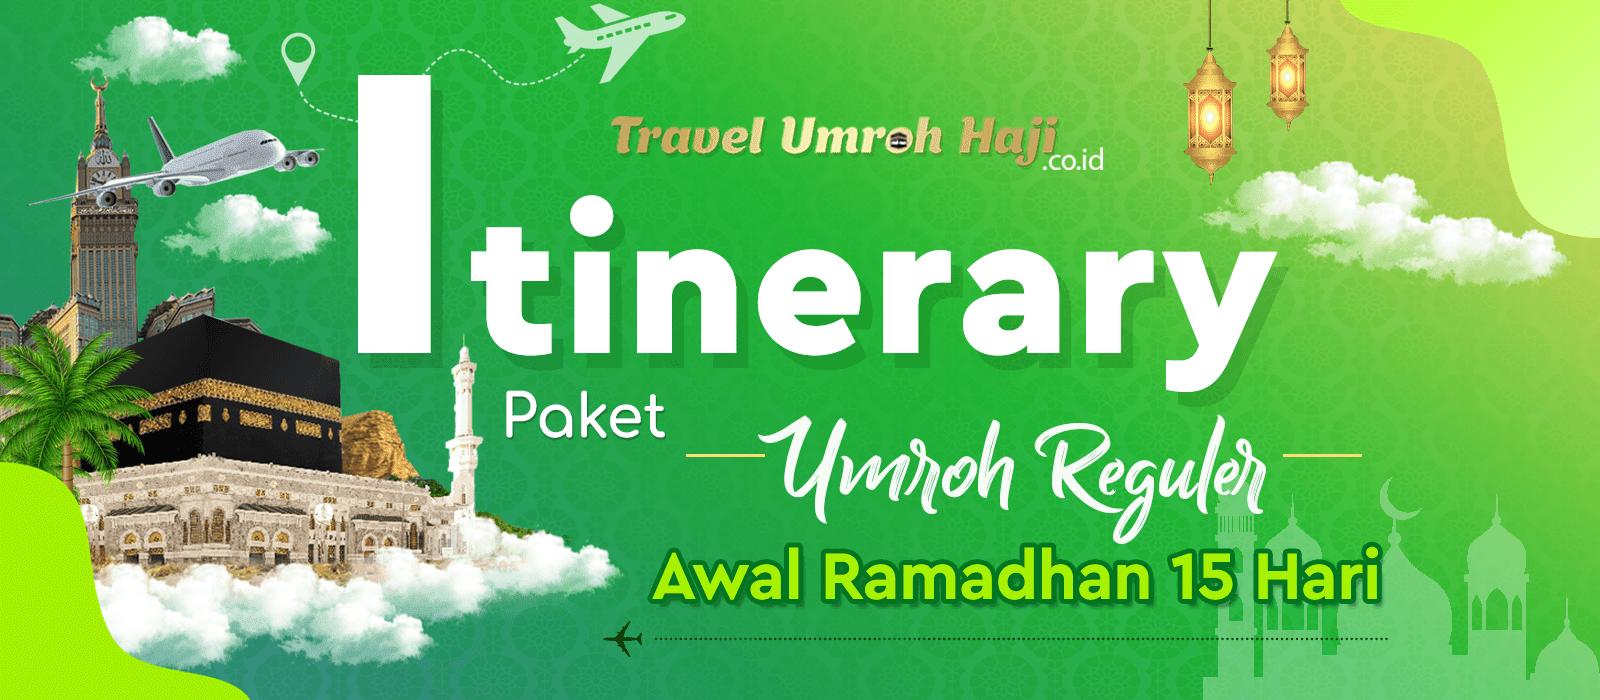 Program Itinerary Umroh 15 Hari Awal Ramadhan Direct Jeddah